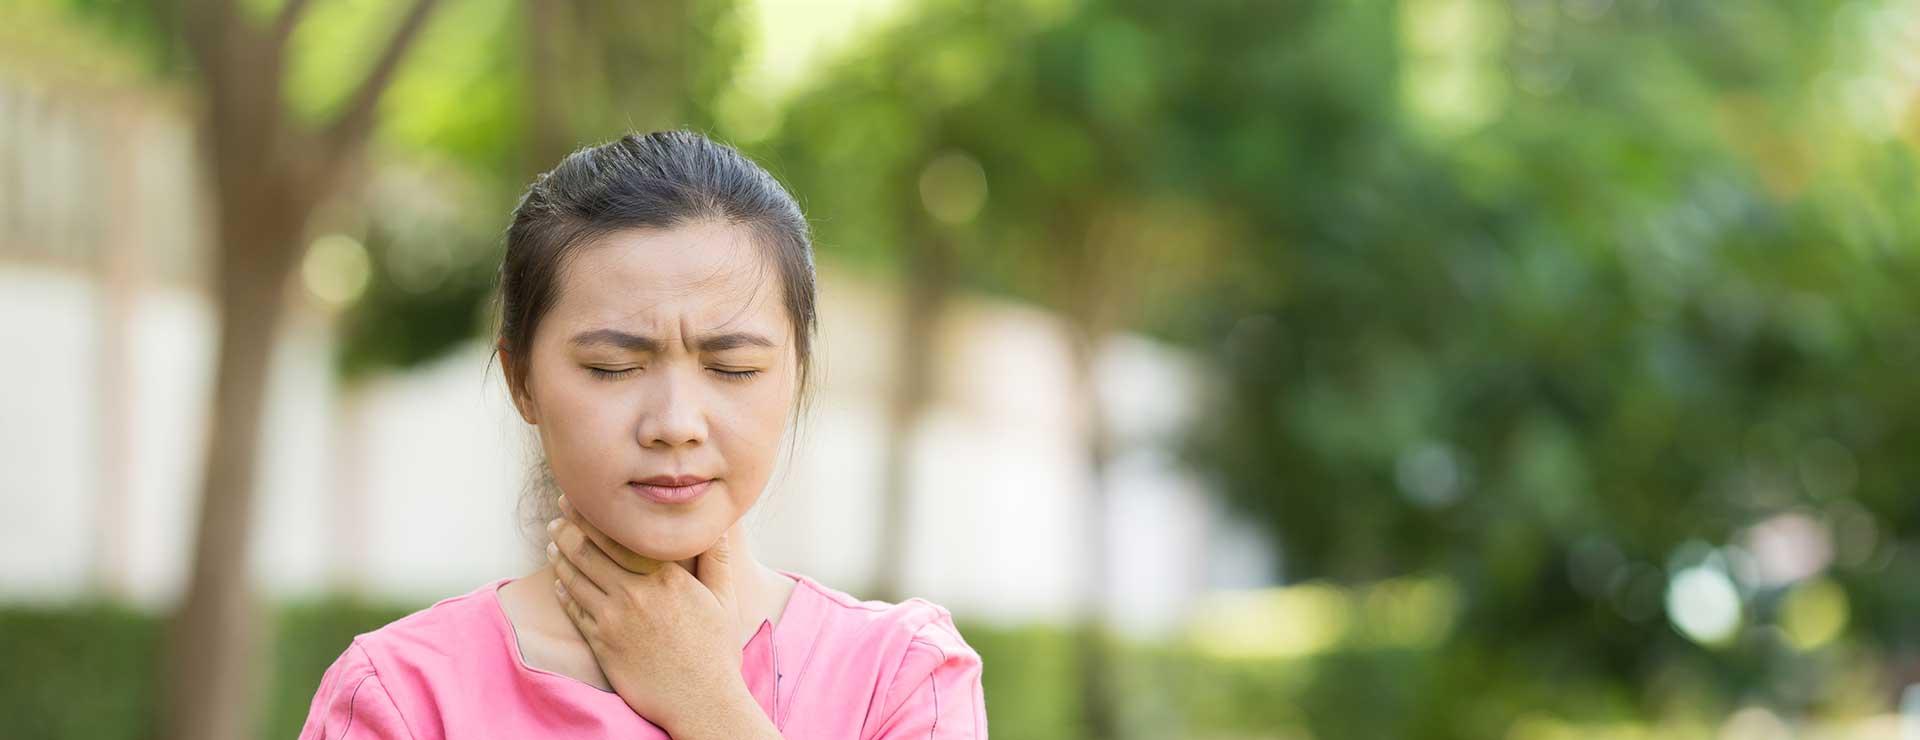 Thyroid Disorders In Women Johns Hopkins Medicine